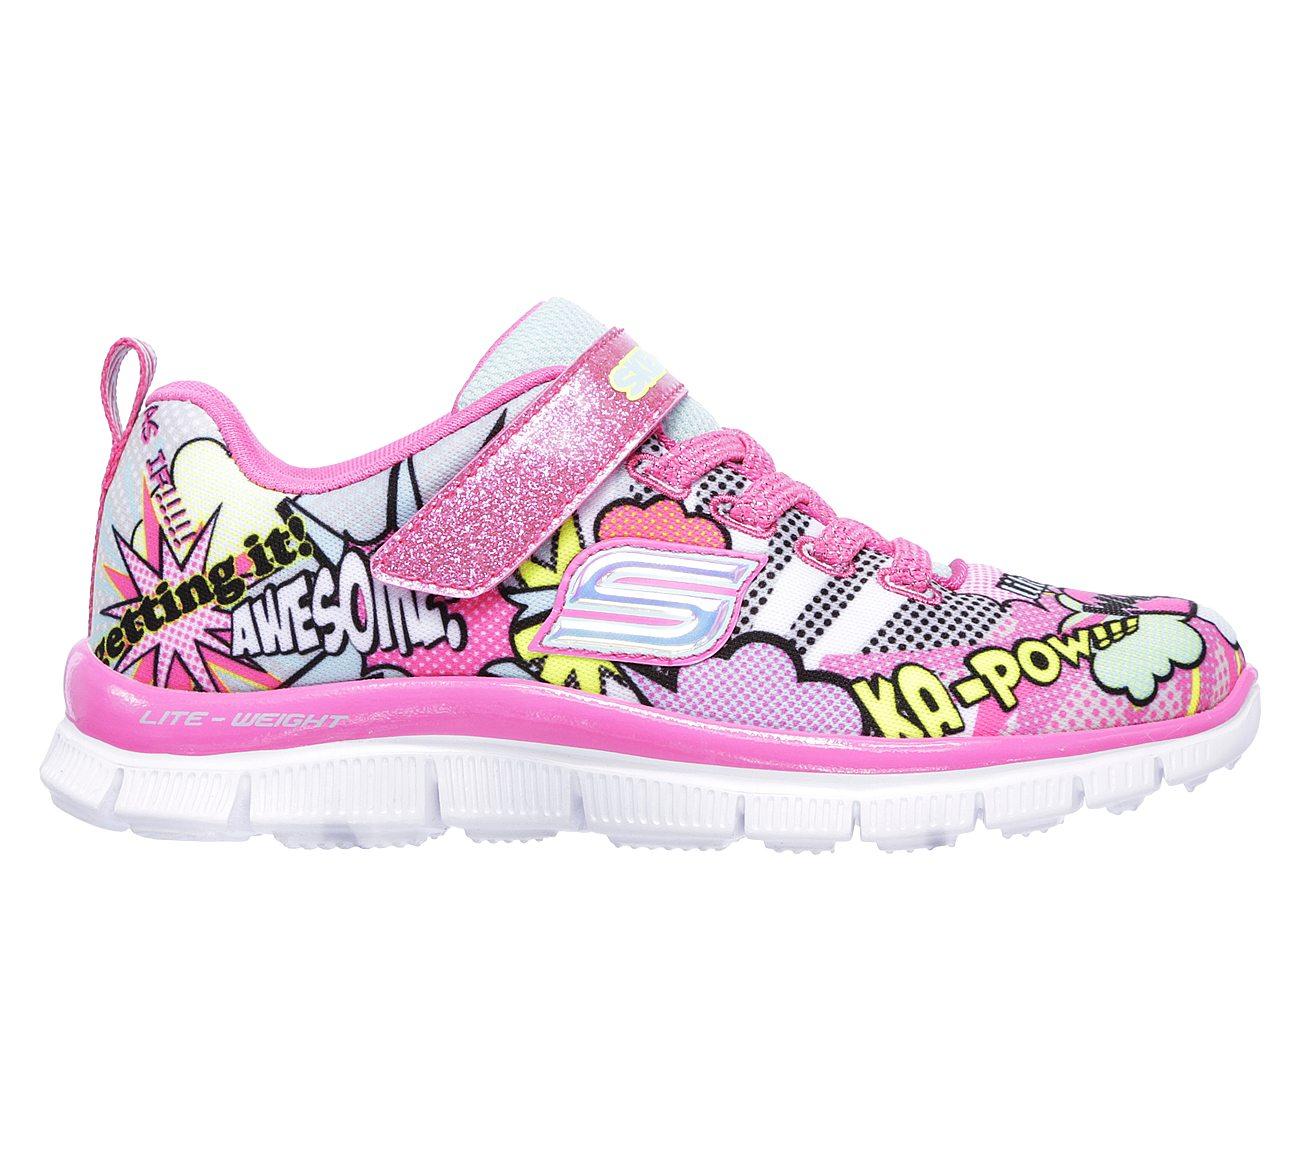 9eb87c4b19c0 Buy SKECHERS Skech Appeal Sport Shoes only  47.00